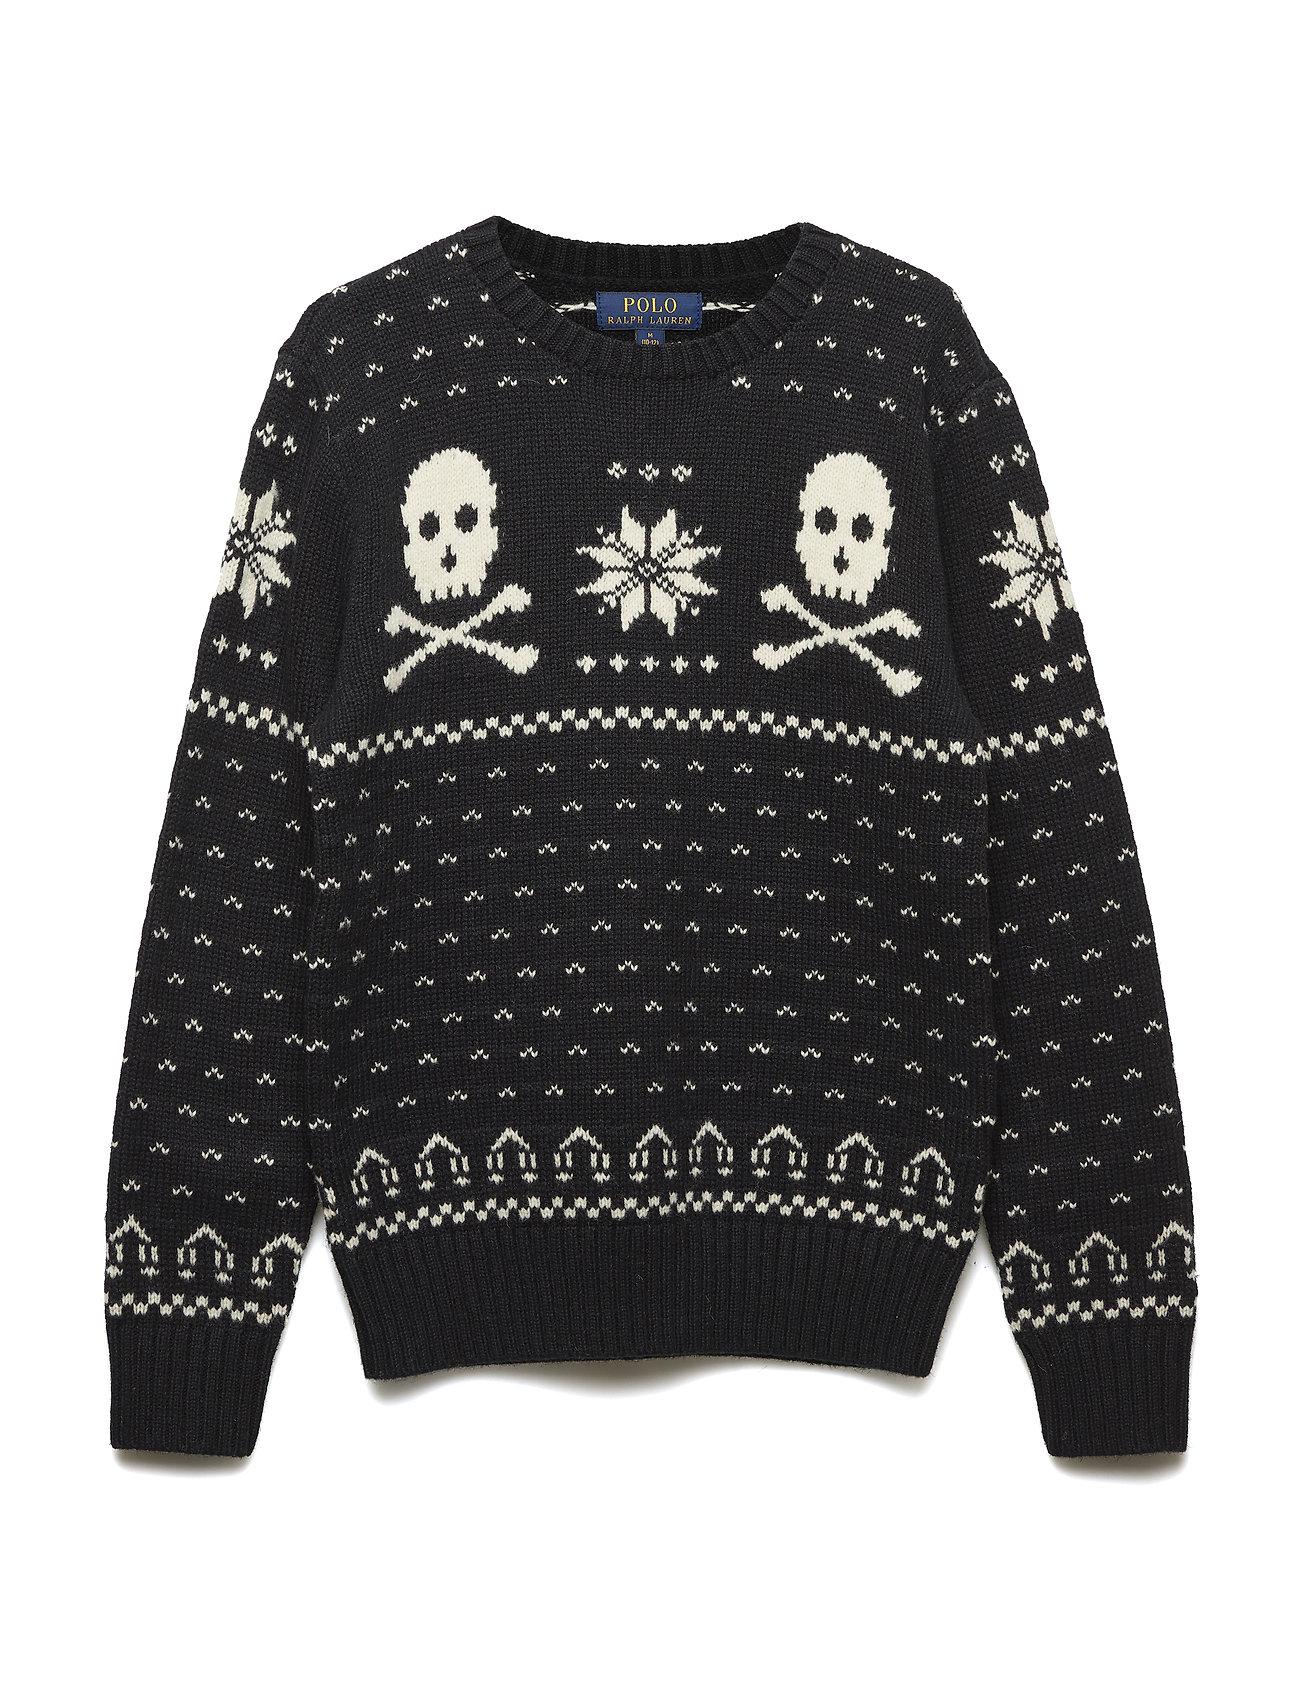 Sweater Sweater Cotton Merino Merino Cotton Ski Bear Ski Bear 3R54AjLqc